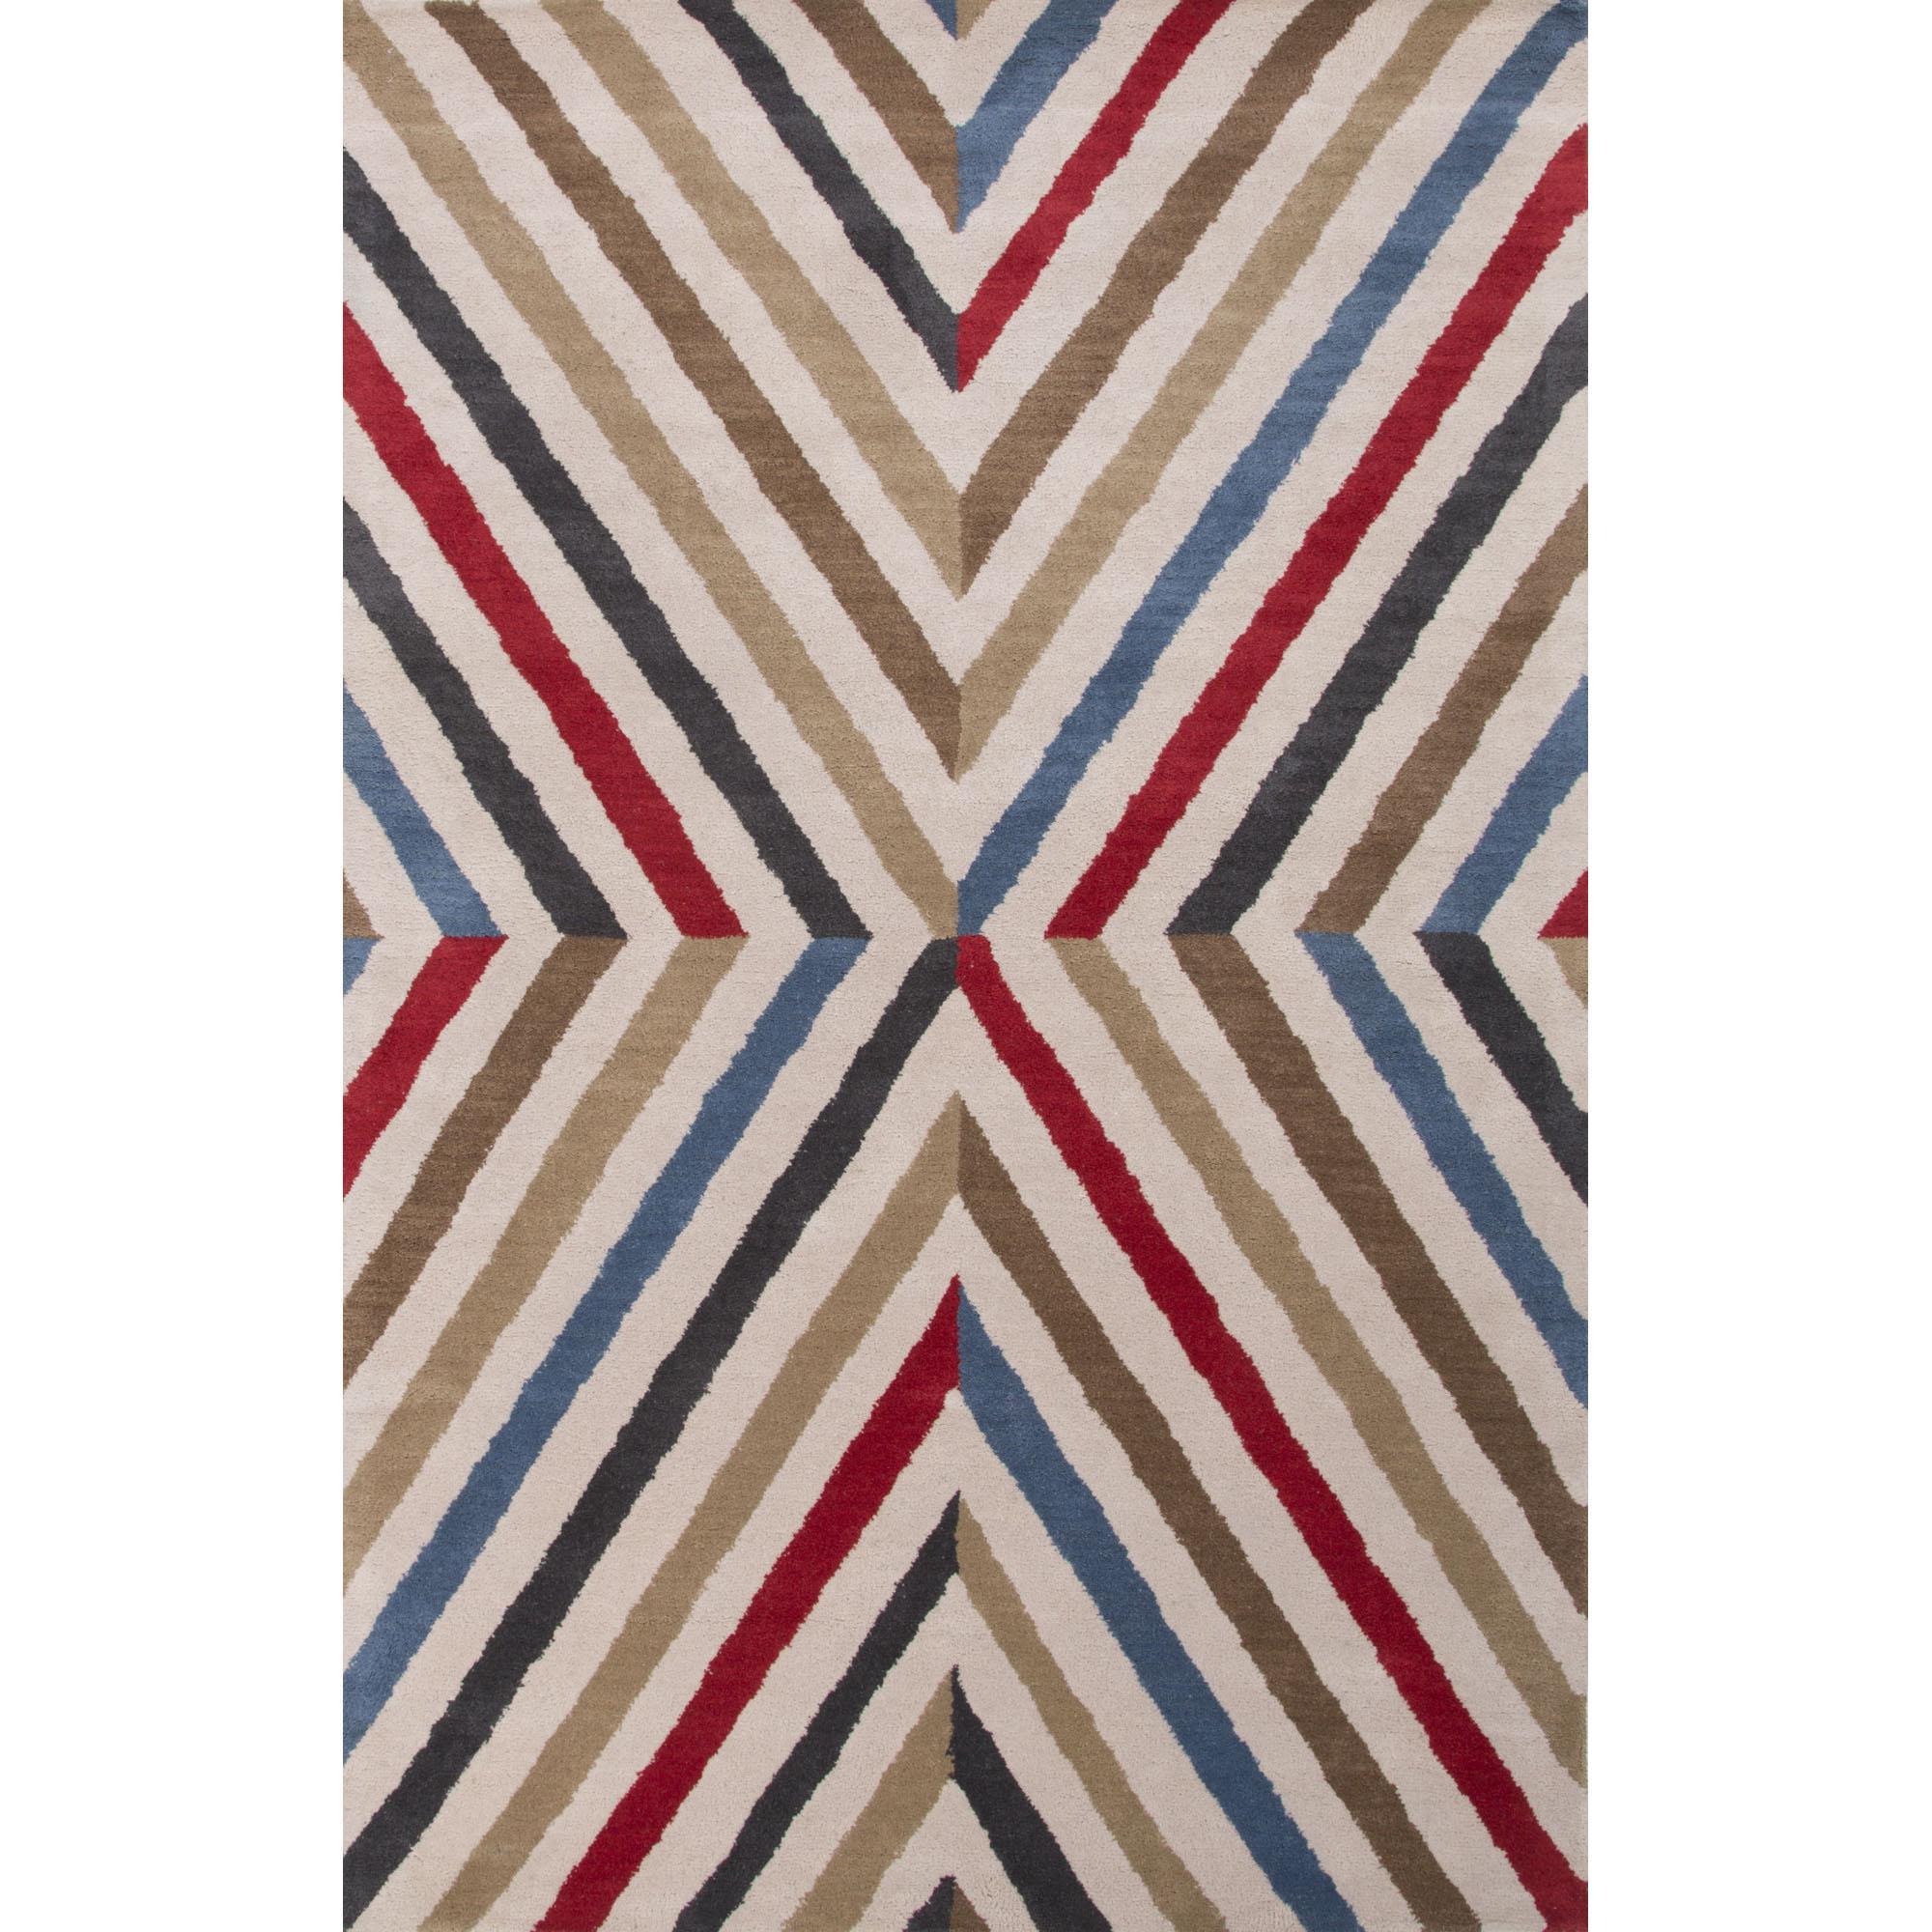 JAIPUR Rugs En Casa By Luli Sanchez Tufted 5 x 8 Rug - Item Number: RUG115647